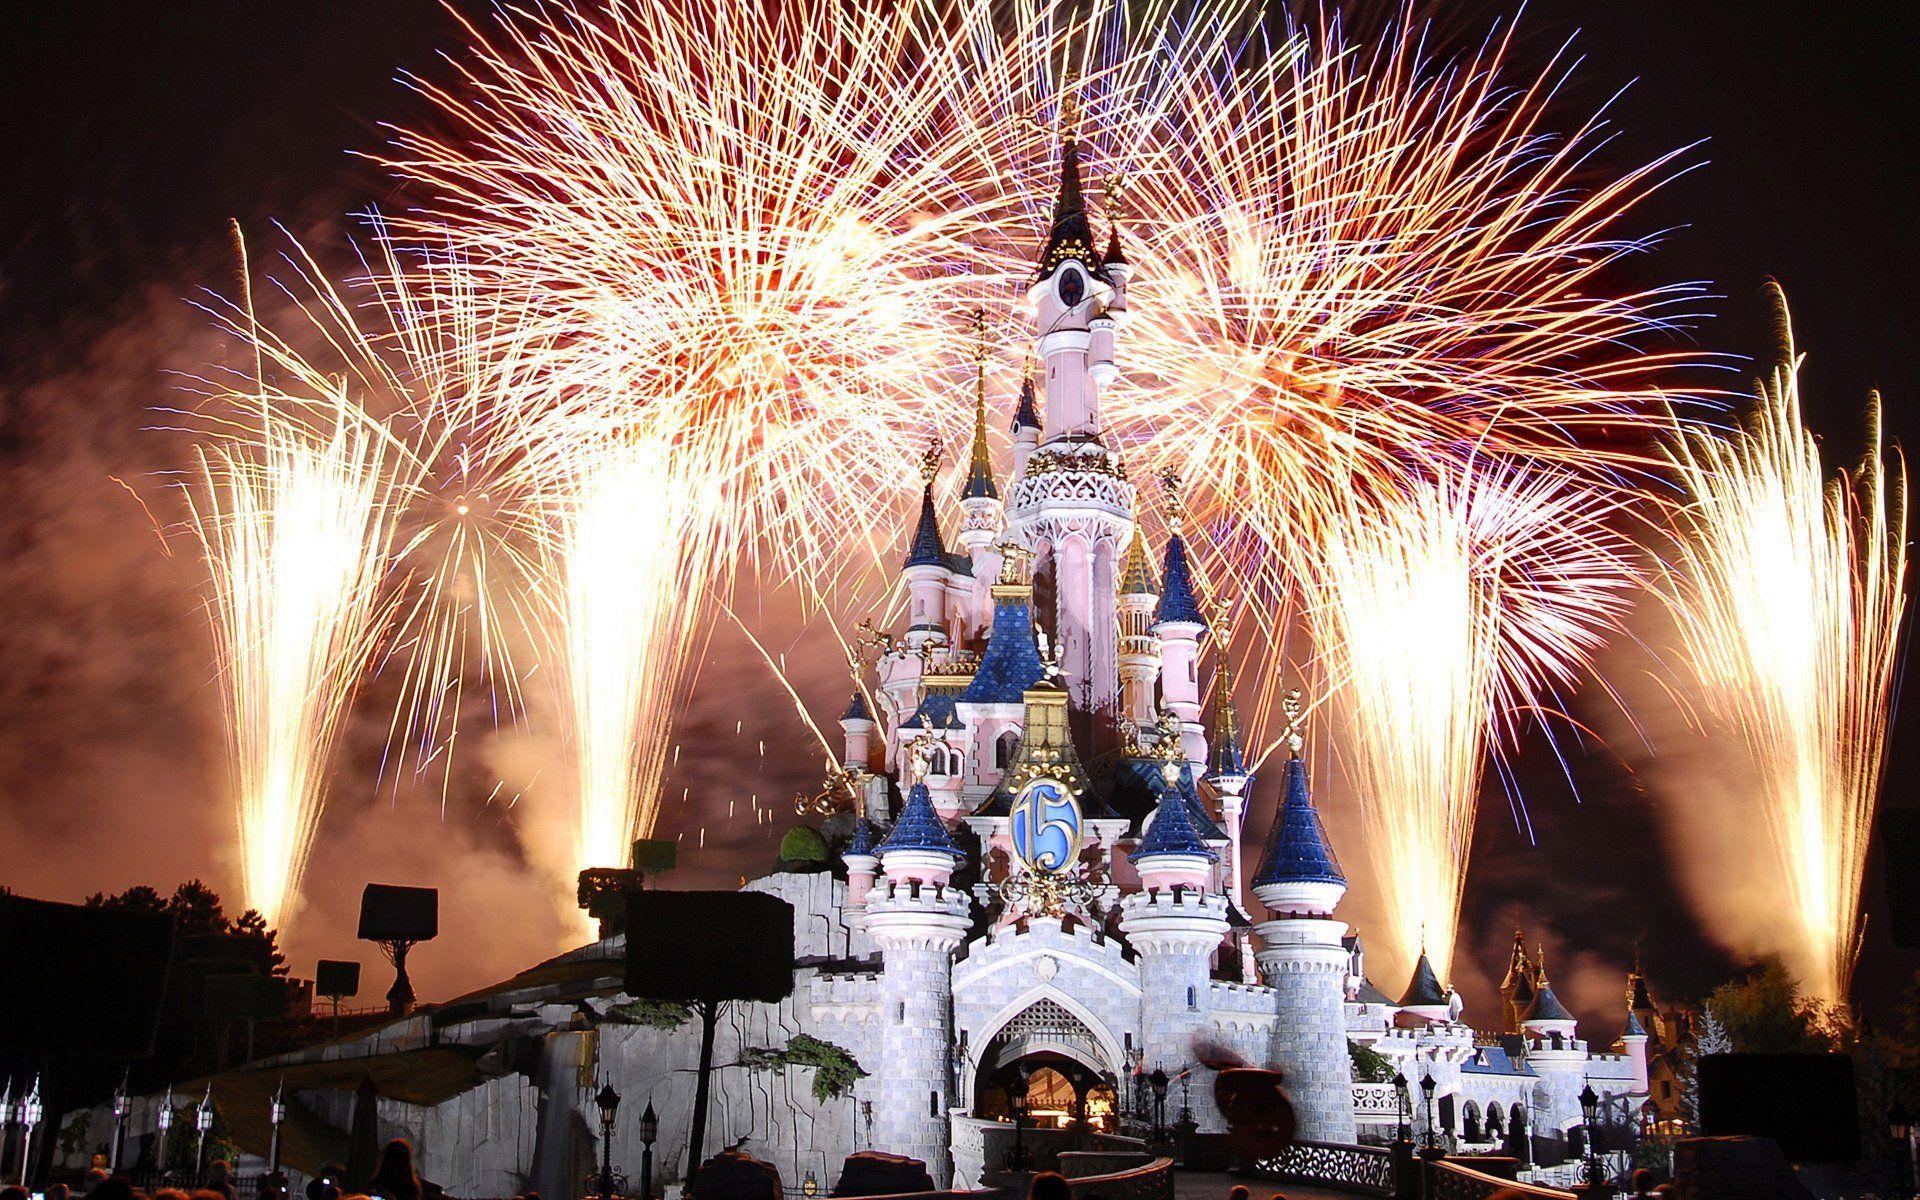 Night Castle Disneyland Fireworks Paris France Castle France Paris Disneyland Cinderella Castle Hd Wallpaper Disneyland Fireworks Disneyland Paris Disney Paris